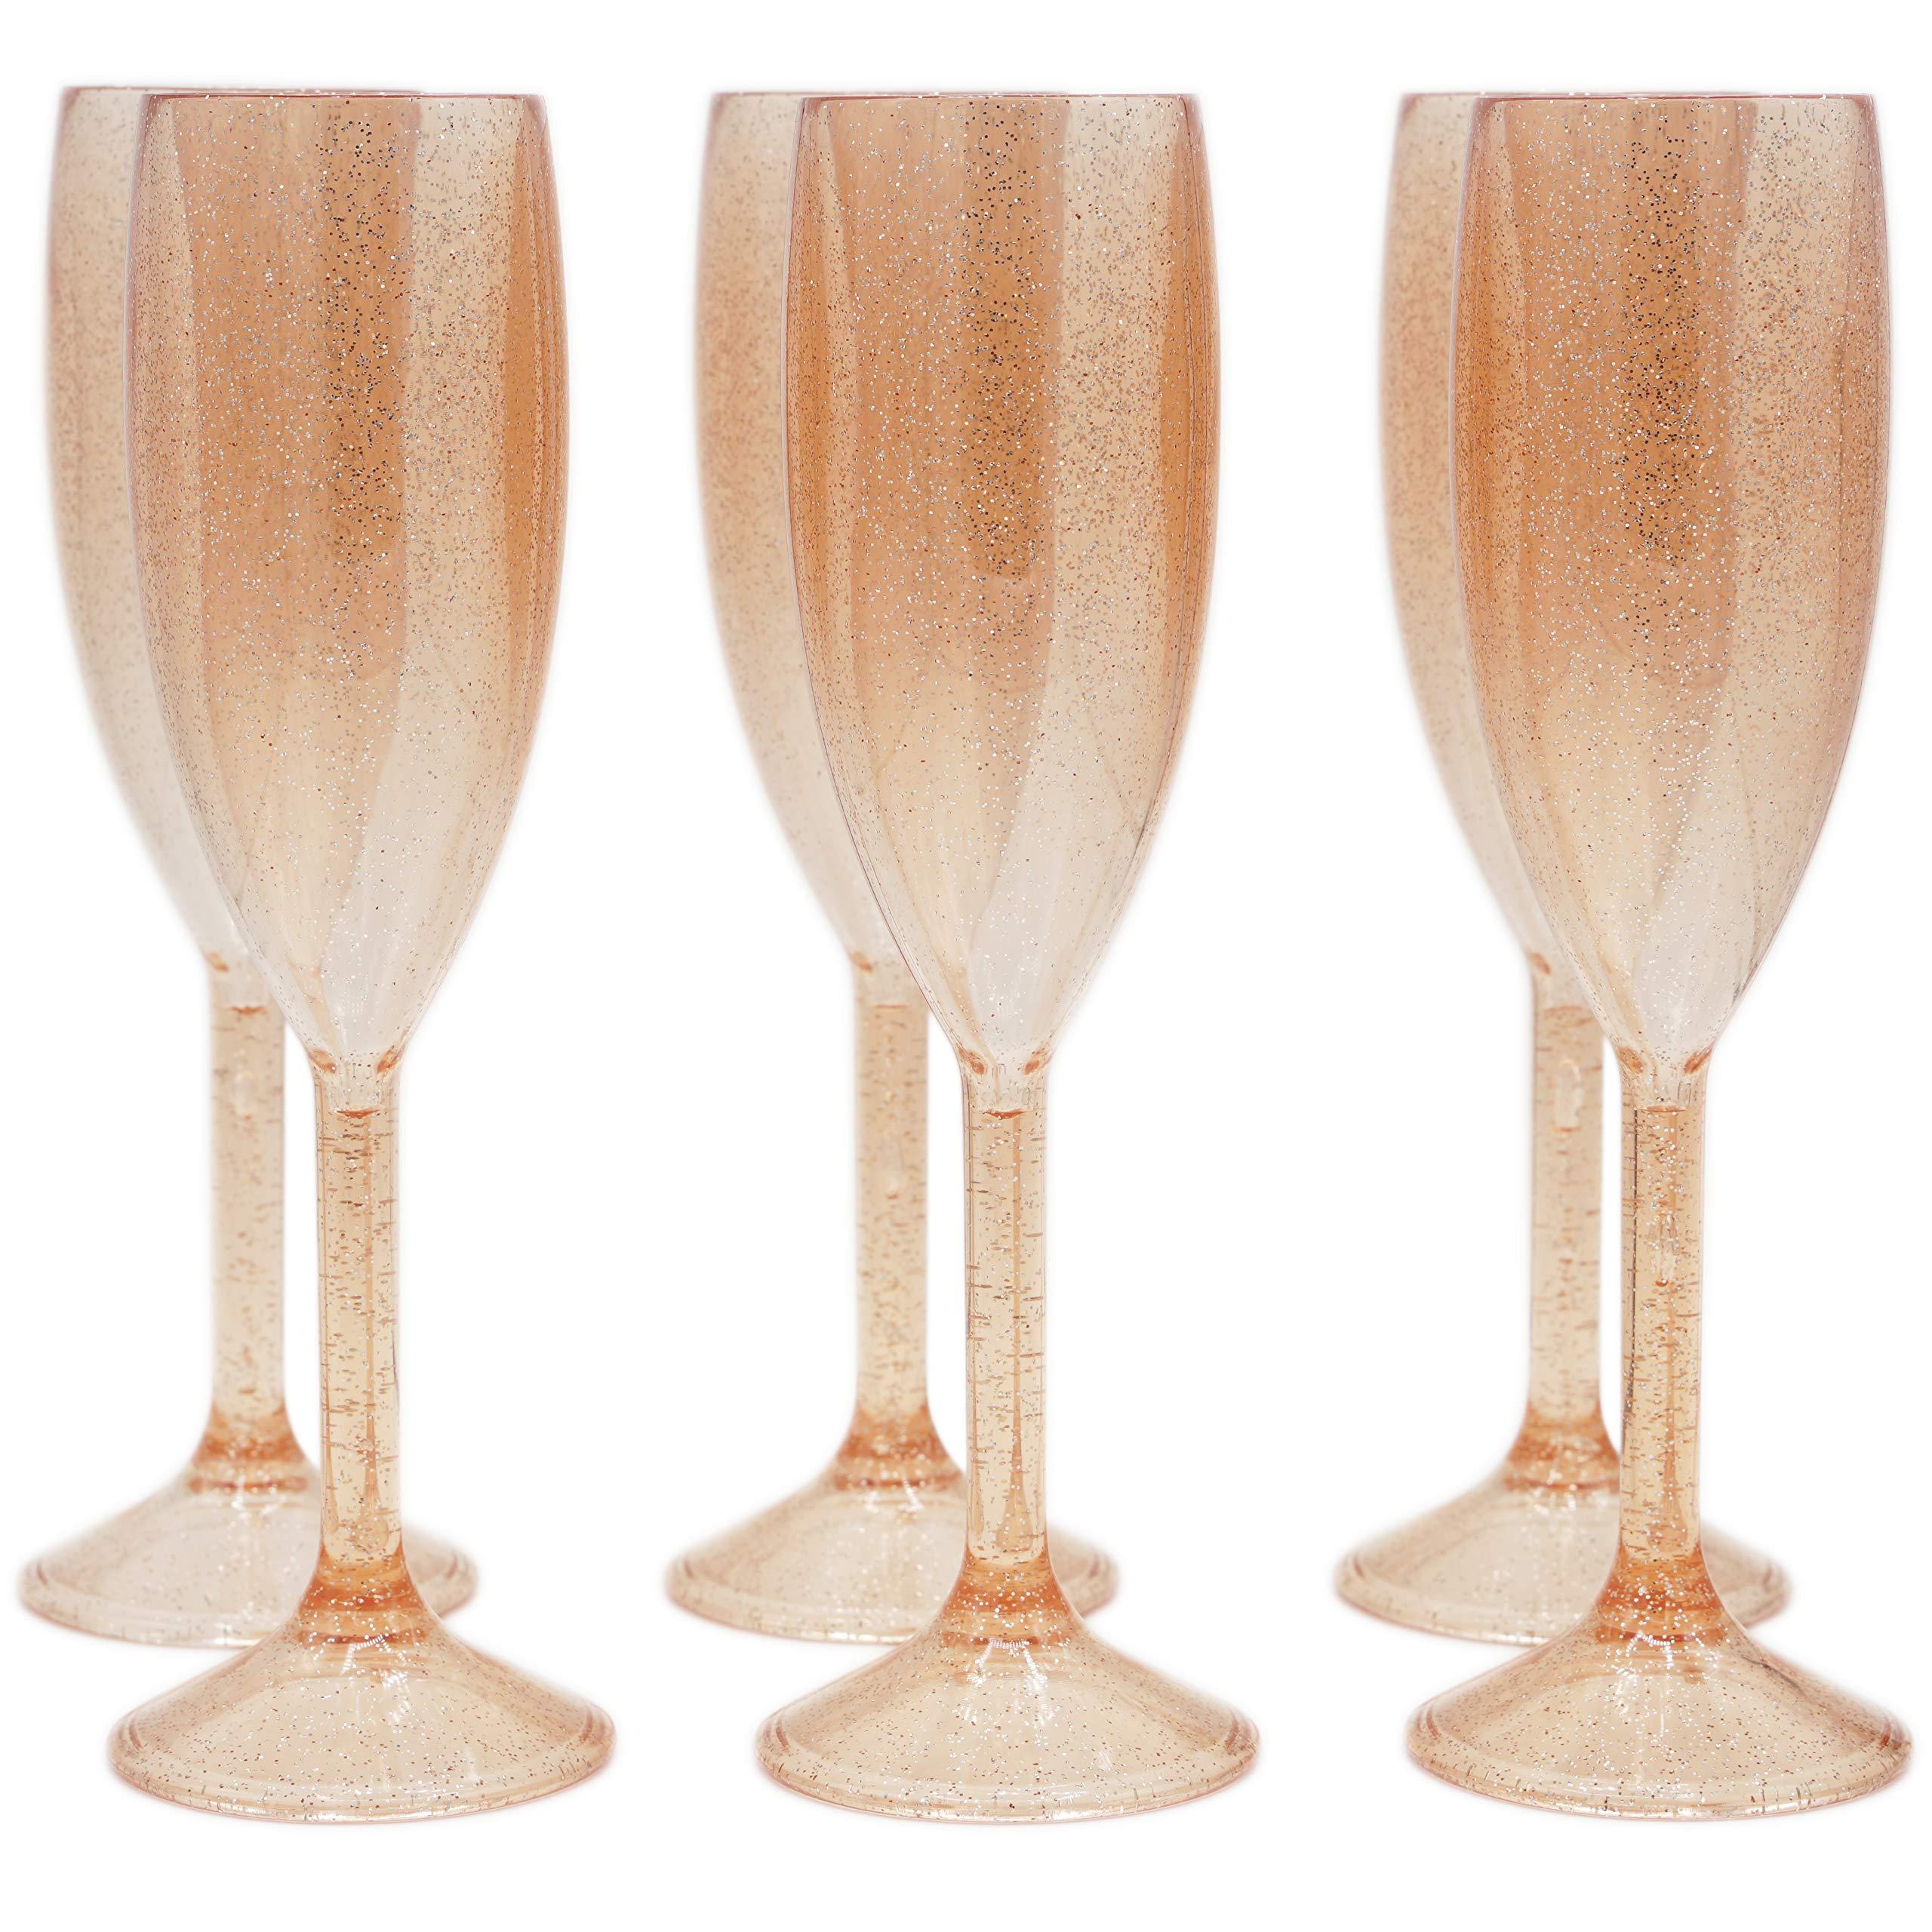 Plastic Champagne Flutes - SET OF 6 Premium Reusable Glasses - 100% Dishwasher Safe - Recyclable & Shatterproof Cups   Rose Gold